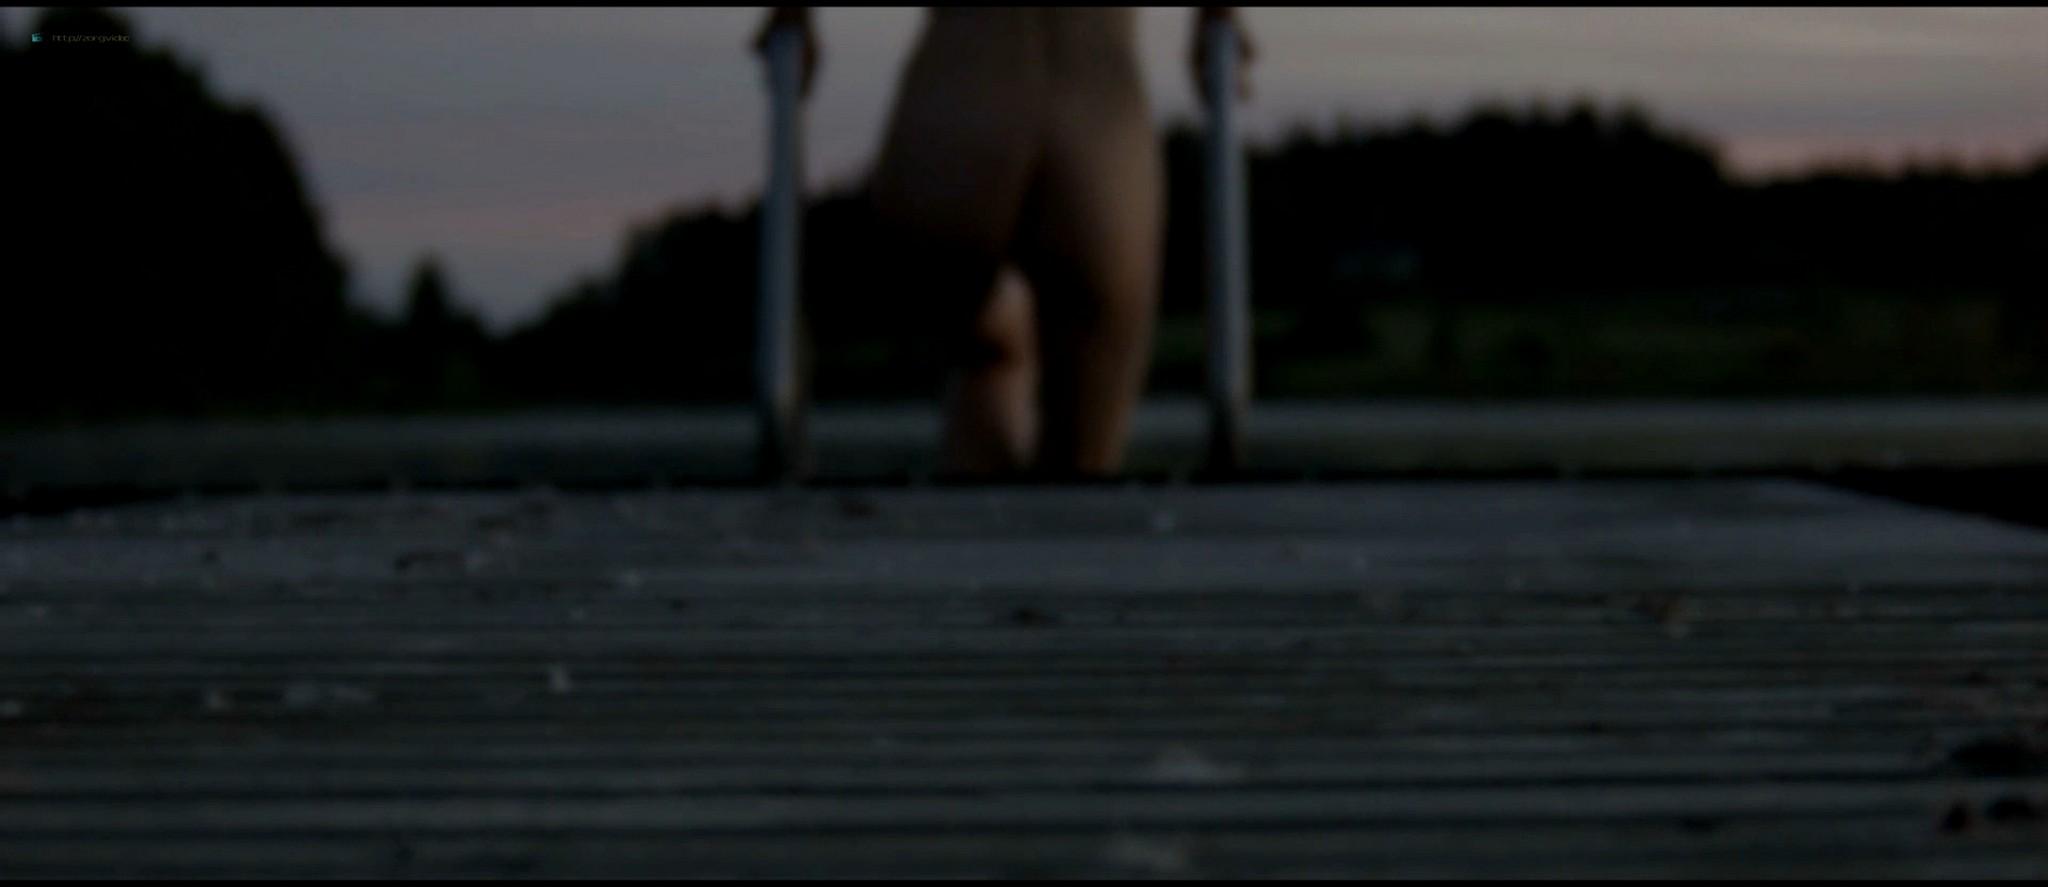 Saara Lamberg nude Jenni Mitchell, April Garreffa nude too - Innuendo (2017) HD 1080p Web (13)